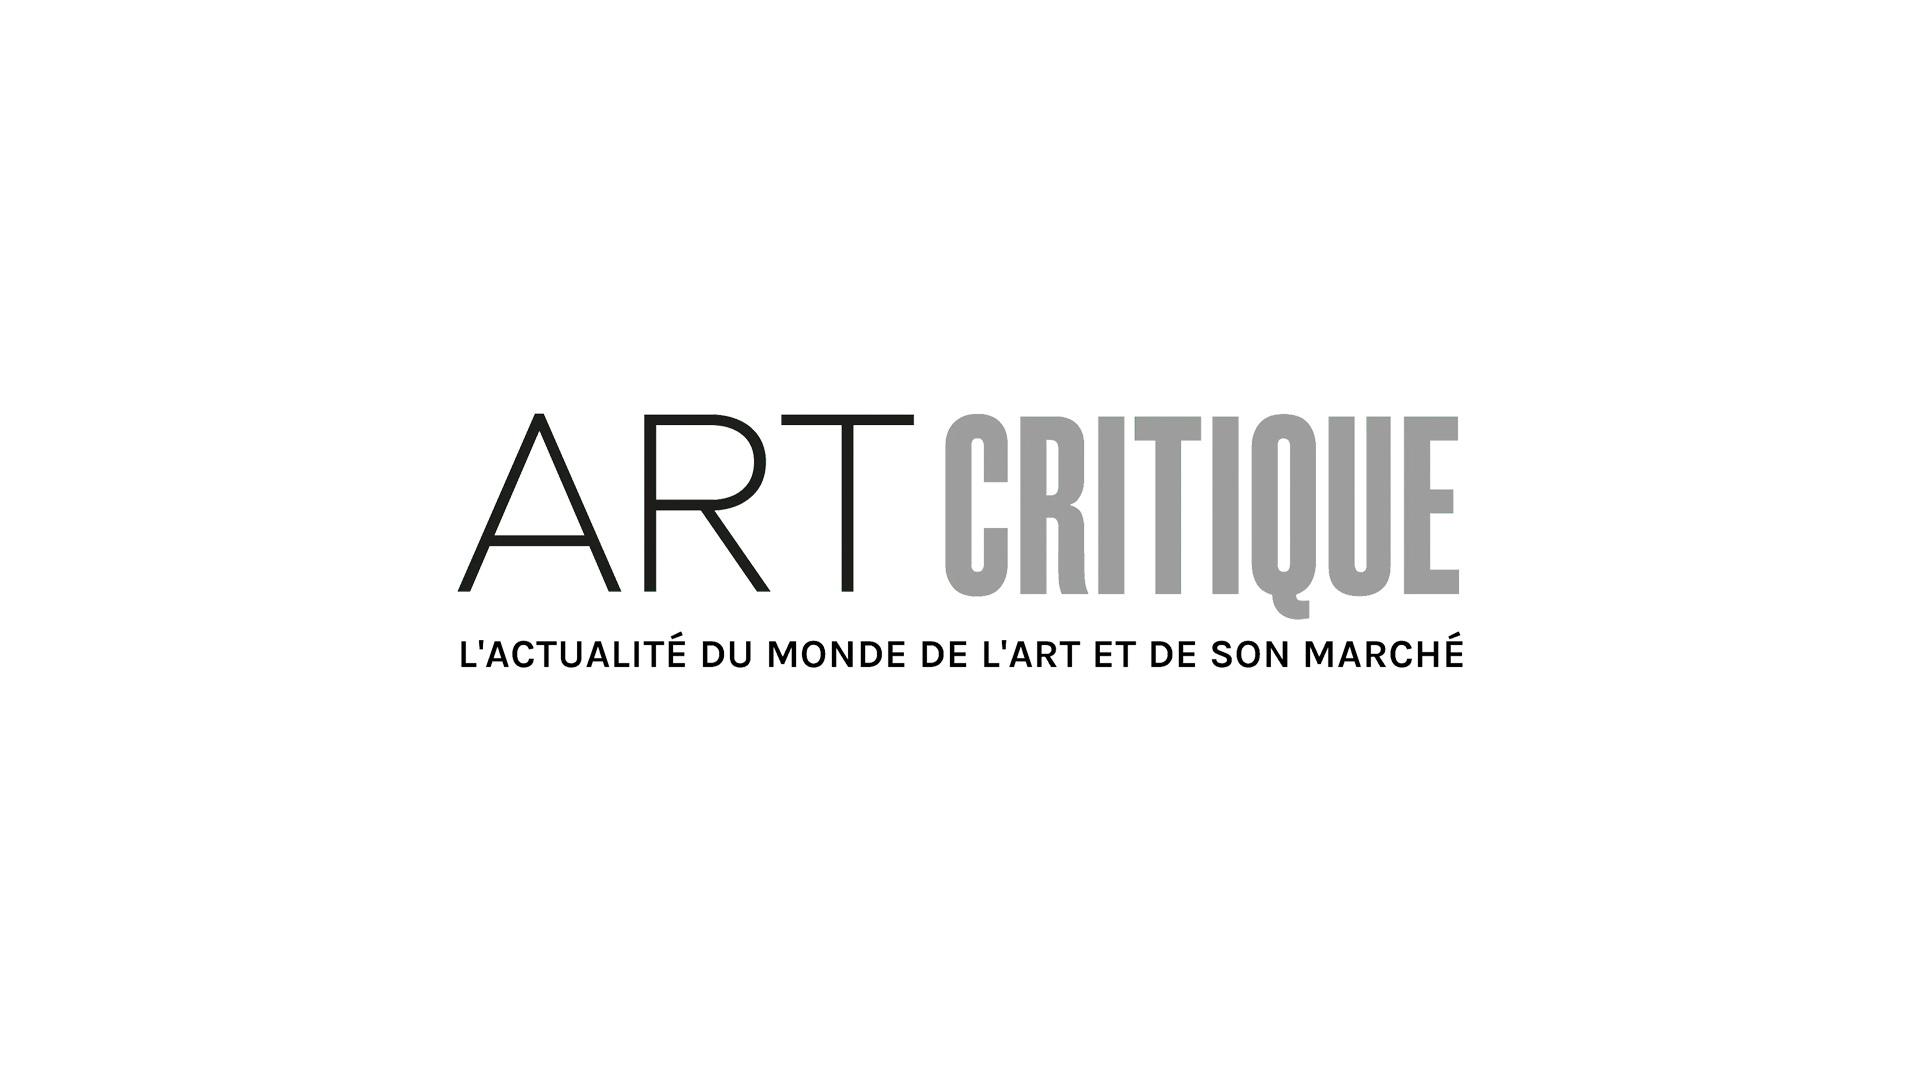 Modeste Testas statue defaced in Bordeaux